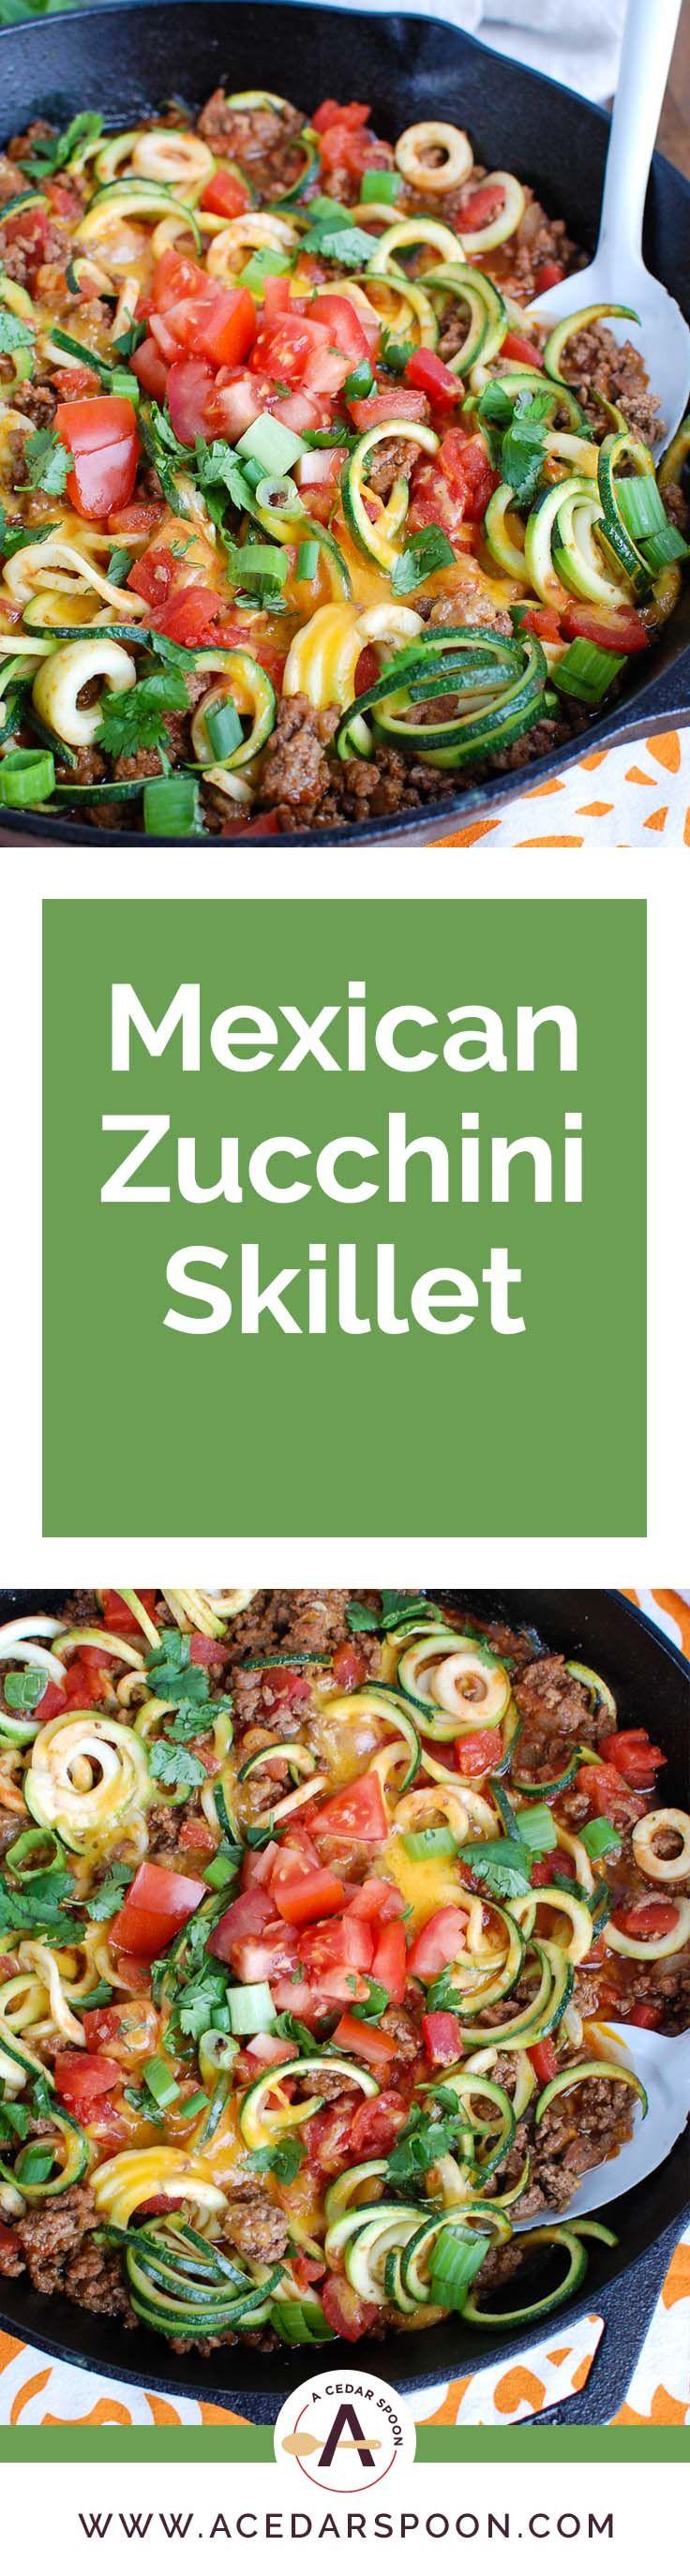 Mexican Zucchini #favourites